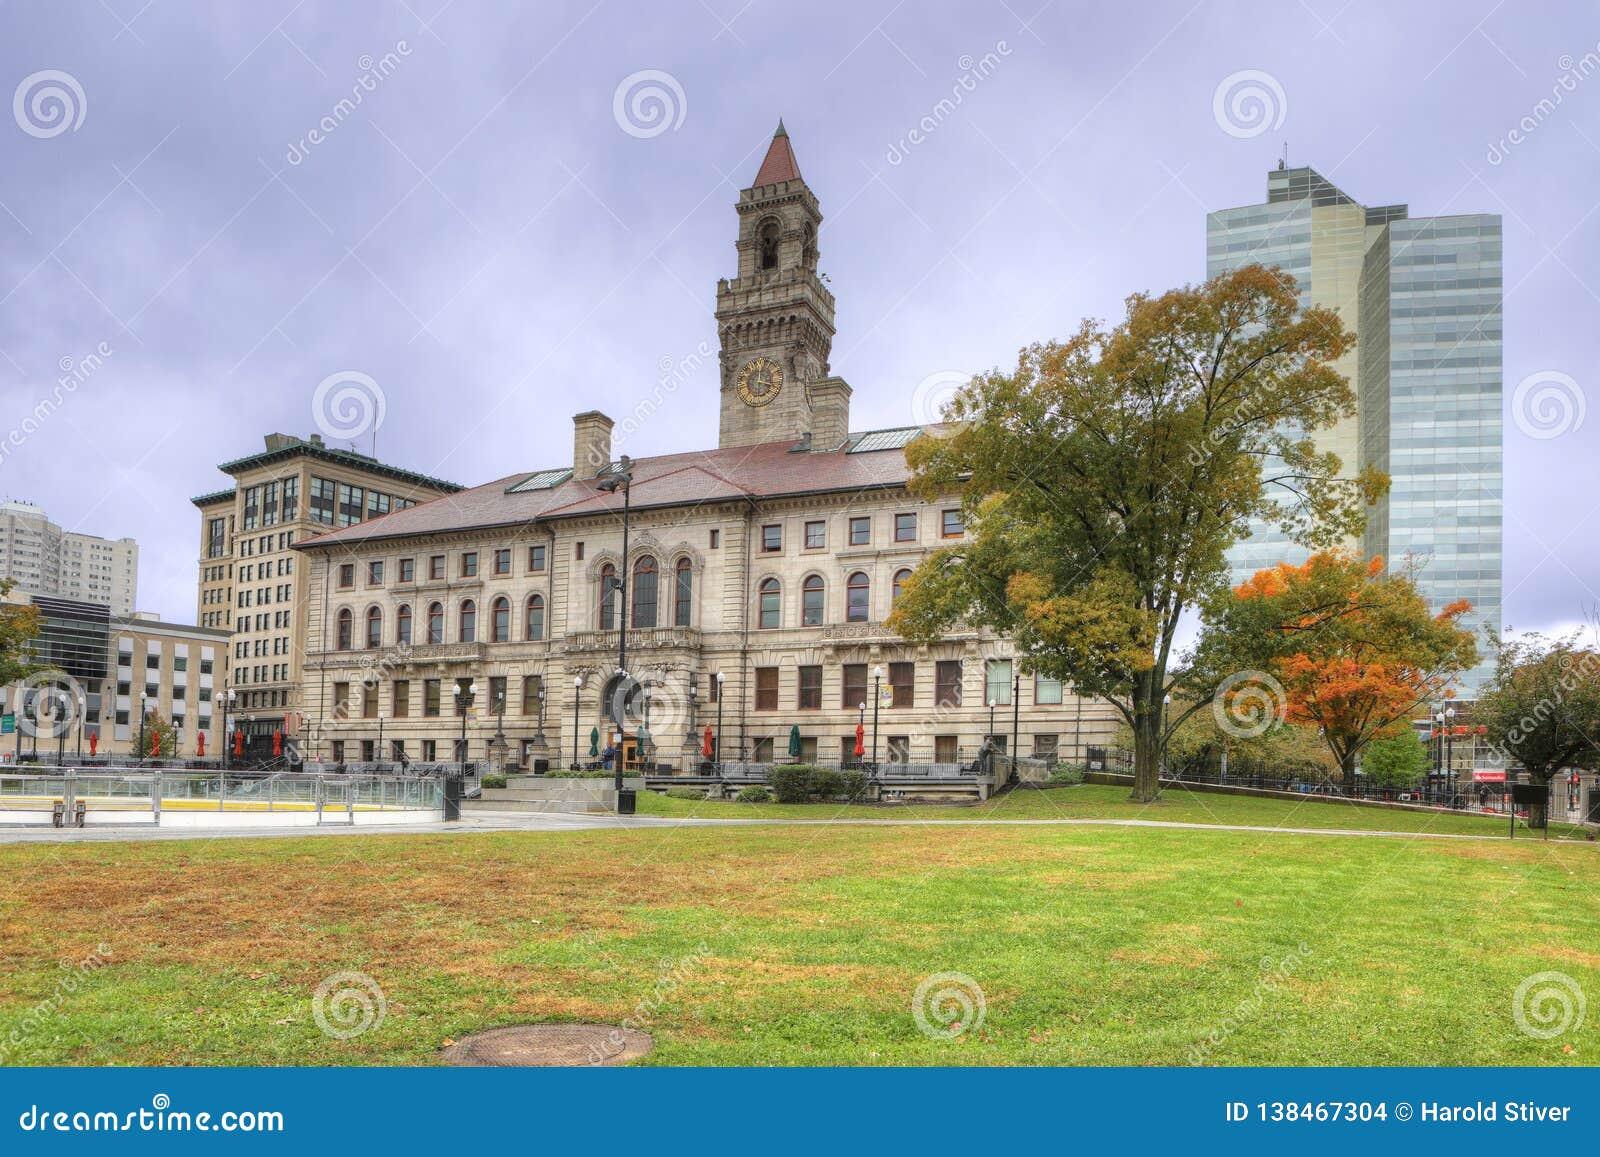 Vista da câmara municipal em Worcester, Massachusetts